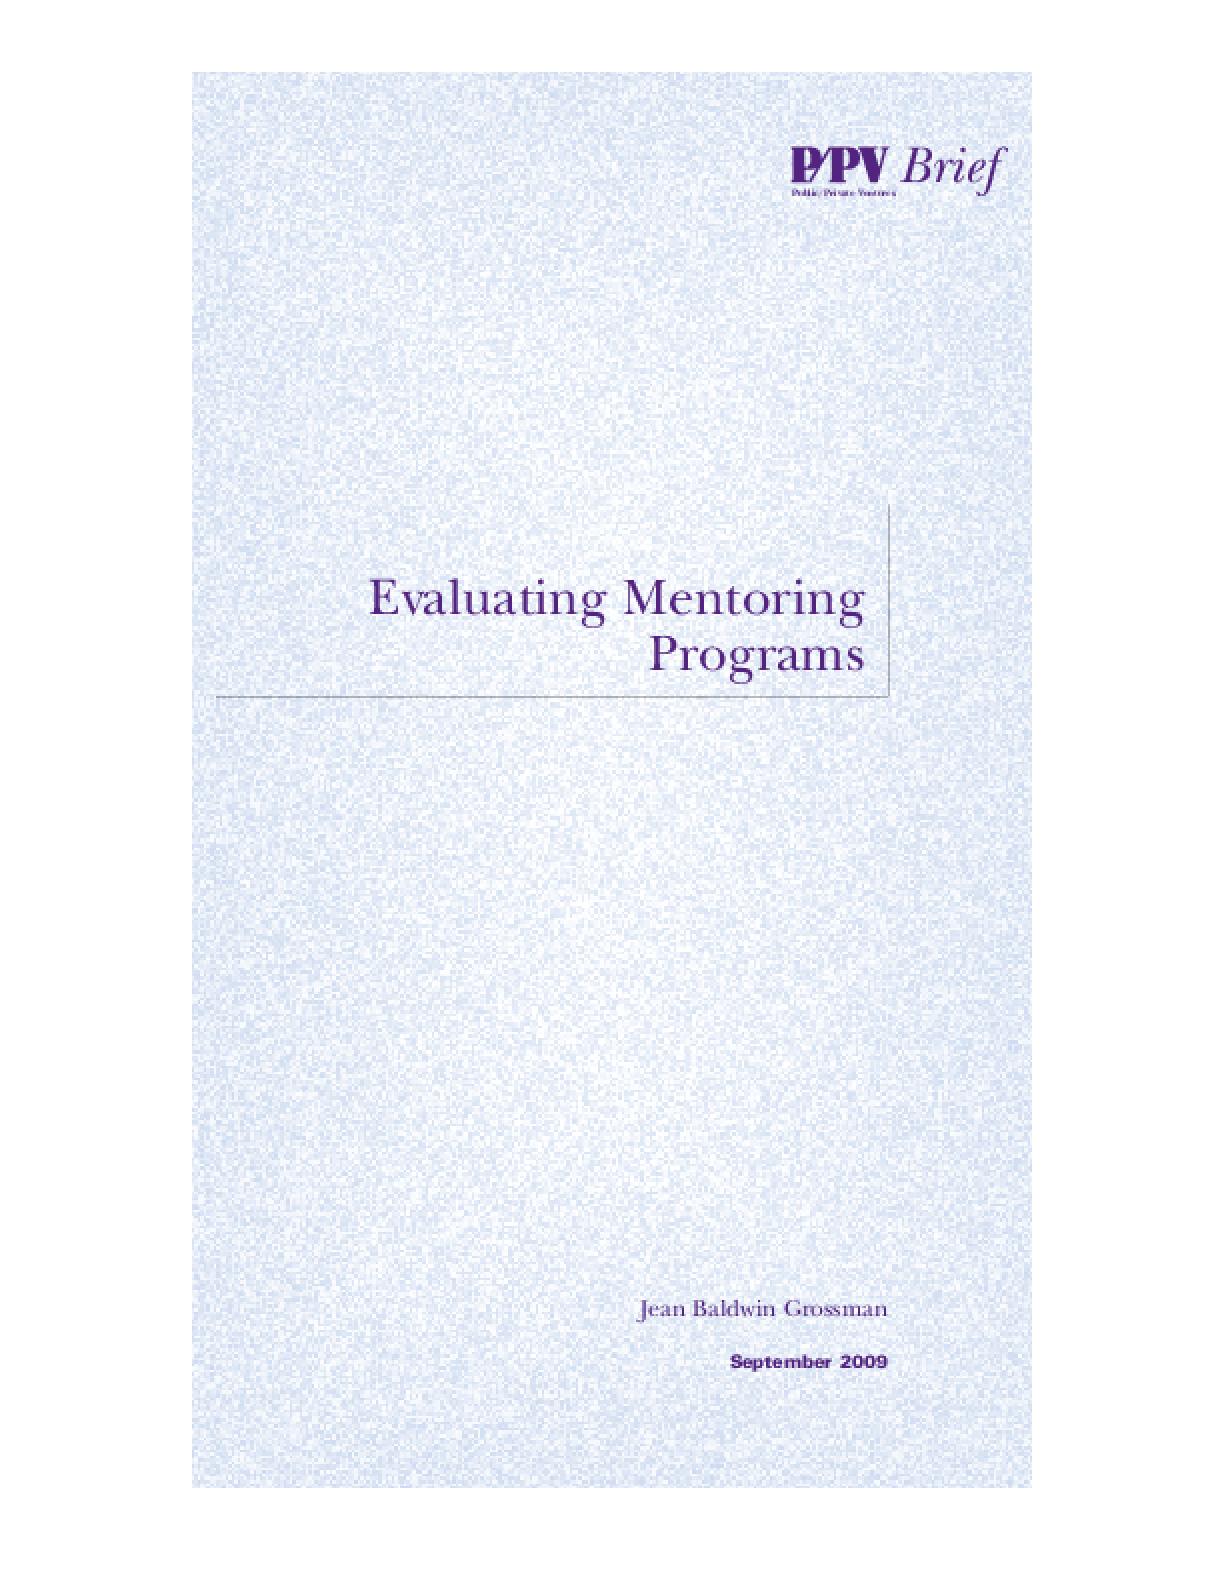 Evaluating Mentoring Programs